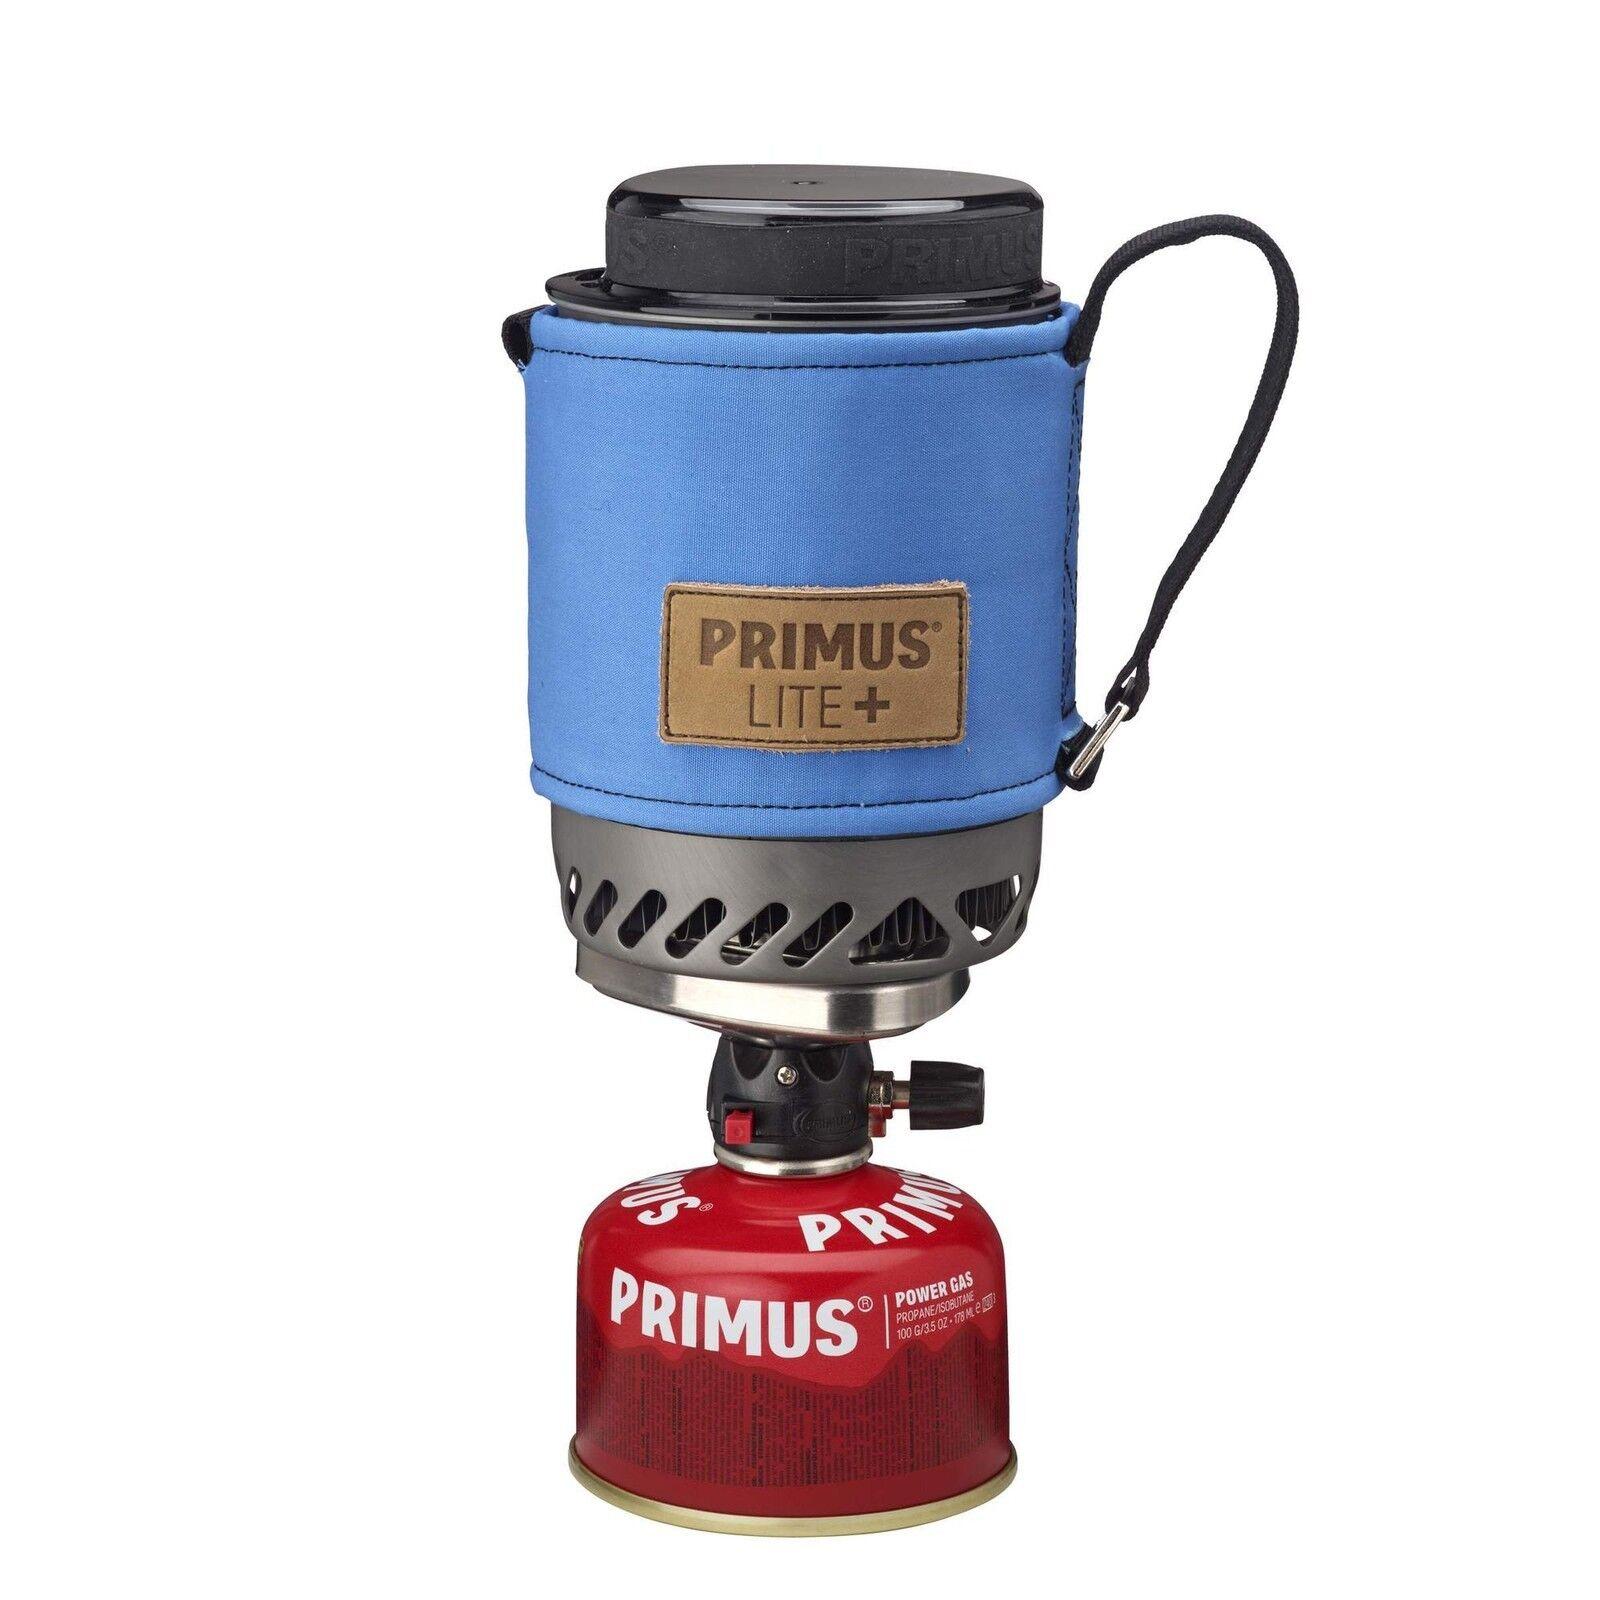 PRIMUS Lite Plus Trekkingkocher, UN-bluee  P356008